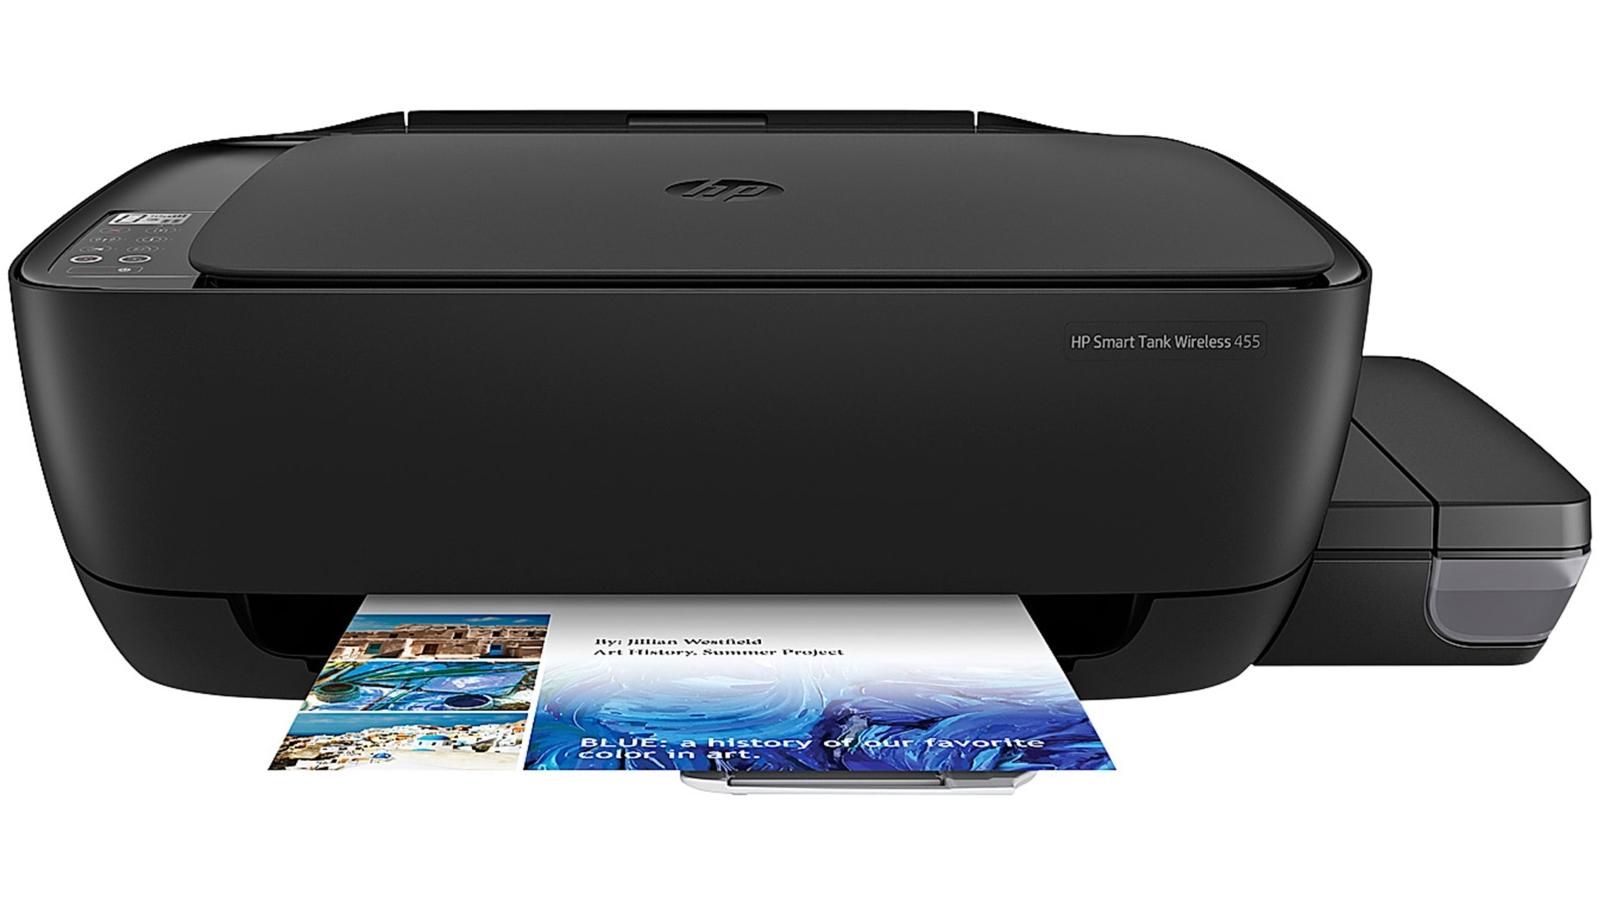 Buy Hp Smart Tank 455 Multifunction Printer Harvey Norman Au Ink Free Mobile Photo Technology